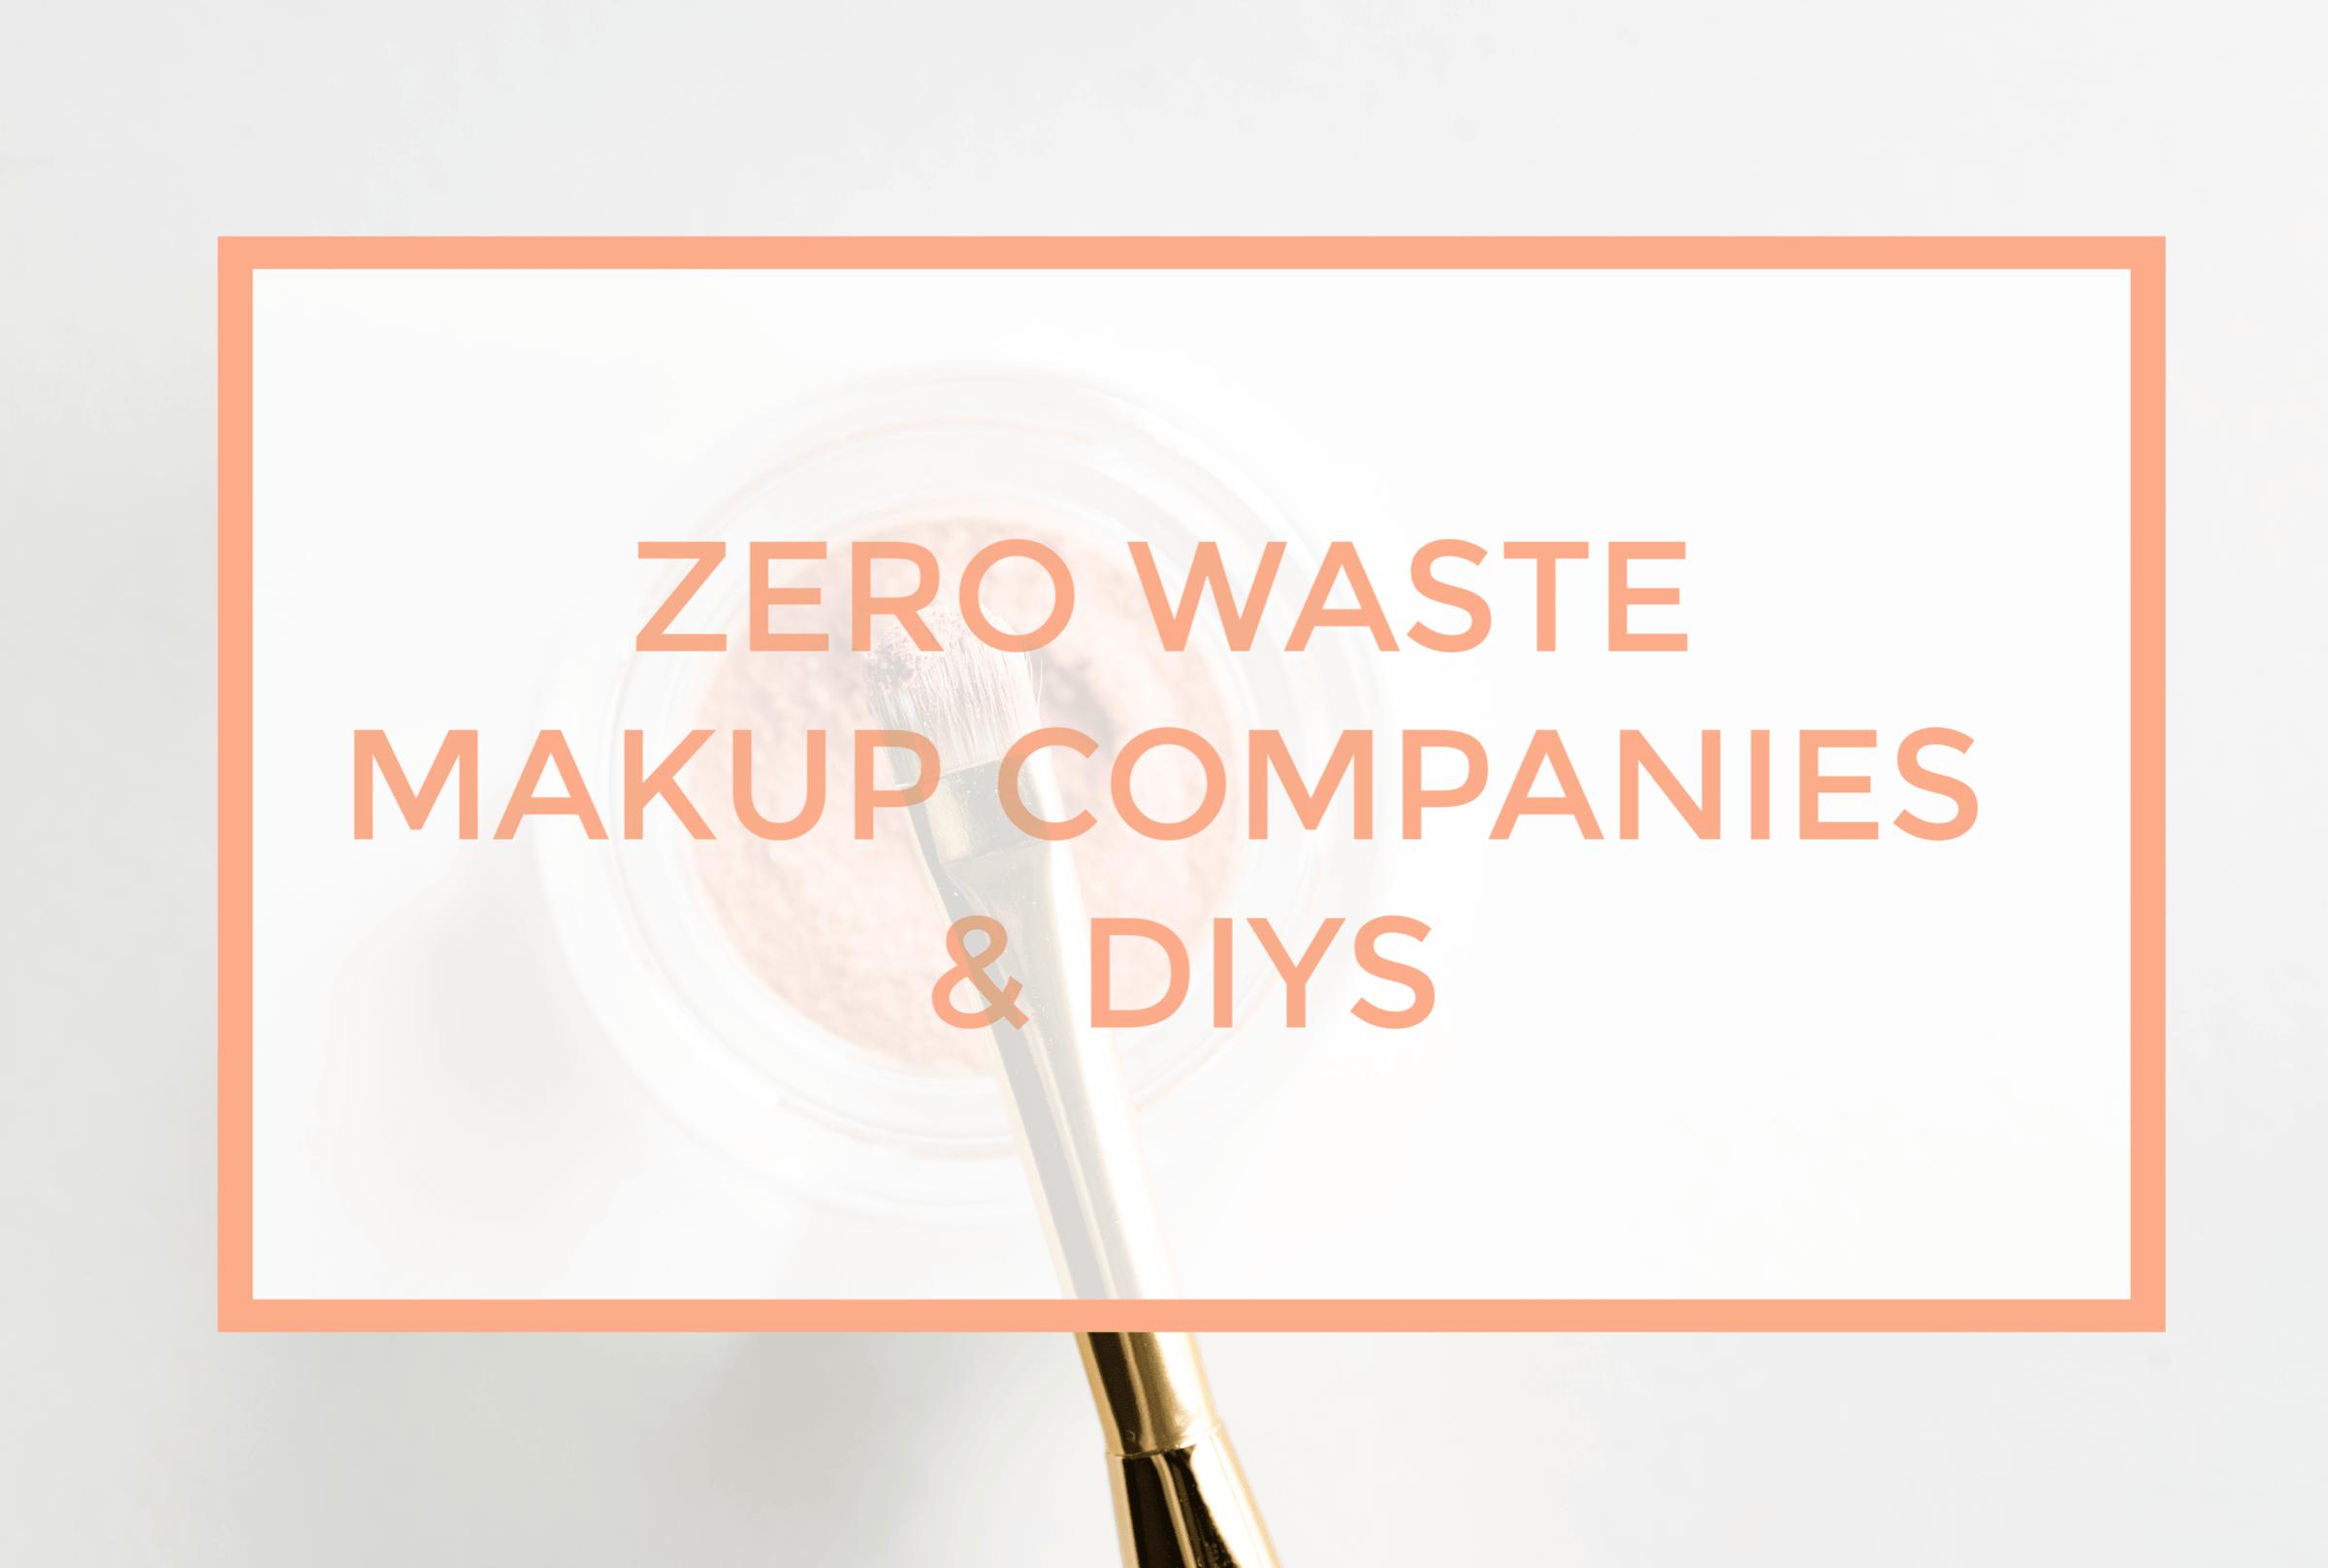 Pforwords My Zero Waste Makeup Routine 0.10 a Day